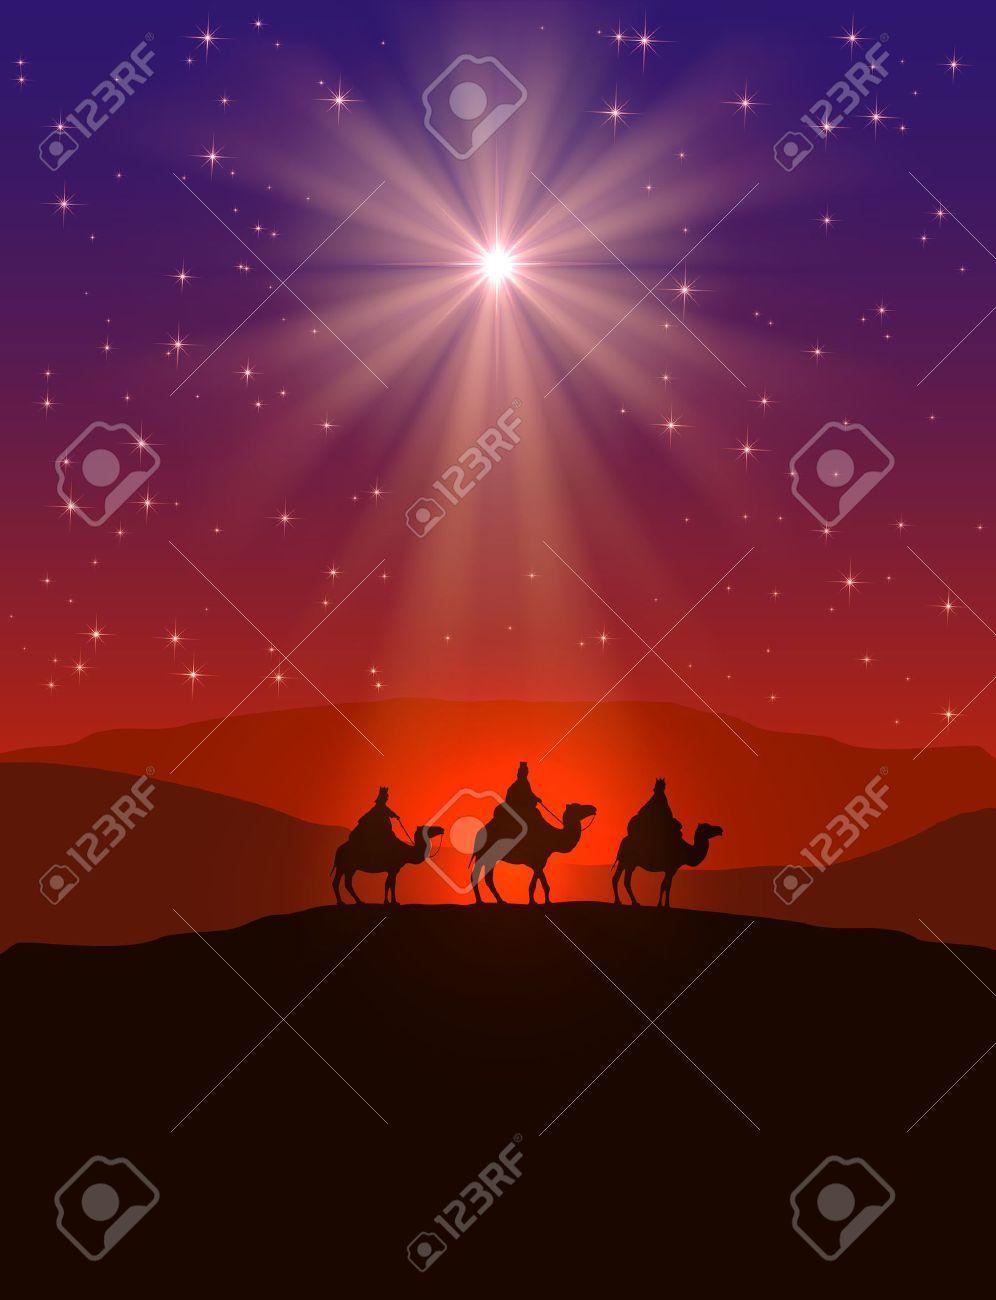 Christmas Background Christian.Christian Christmas Background With Shining Star On Night Sky